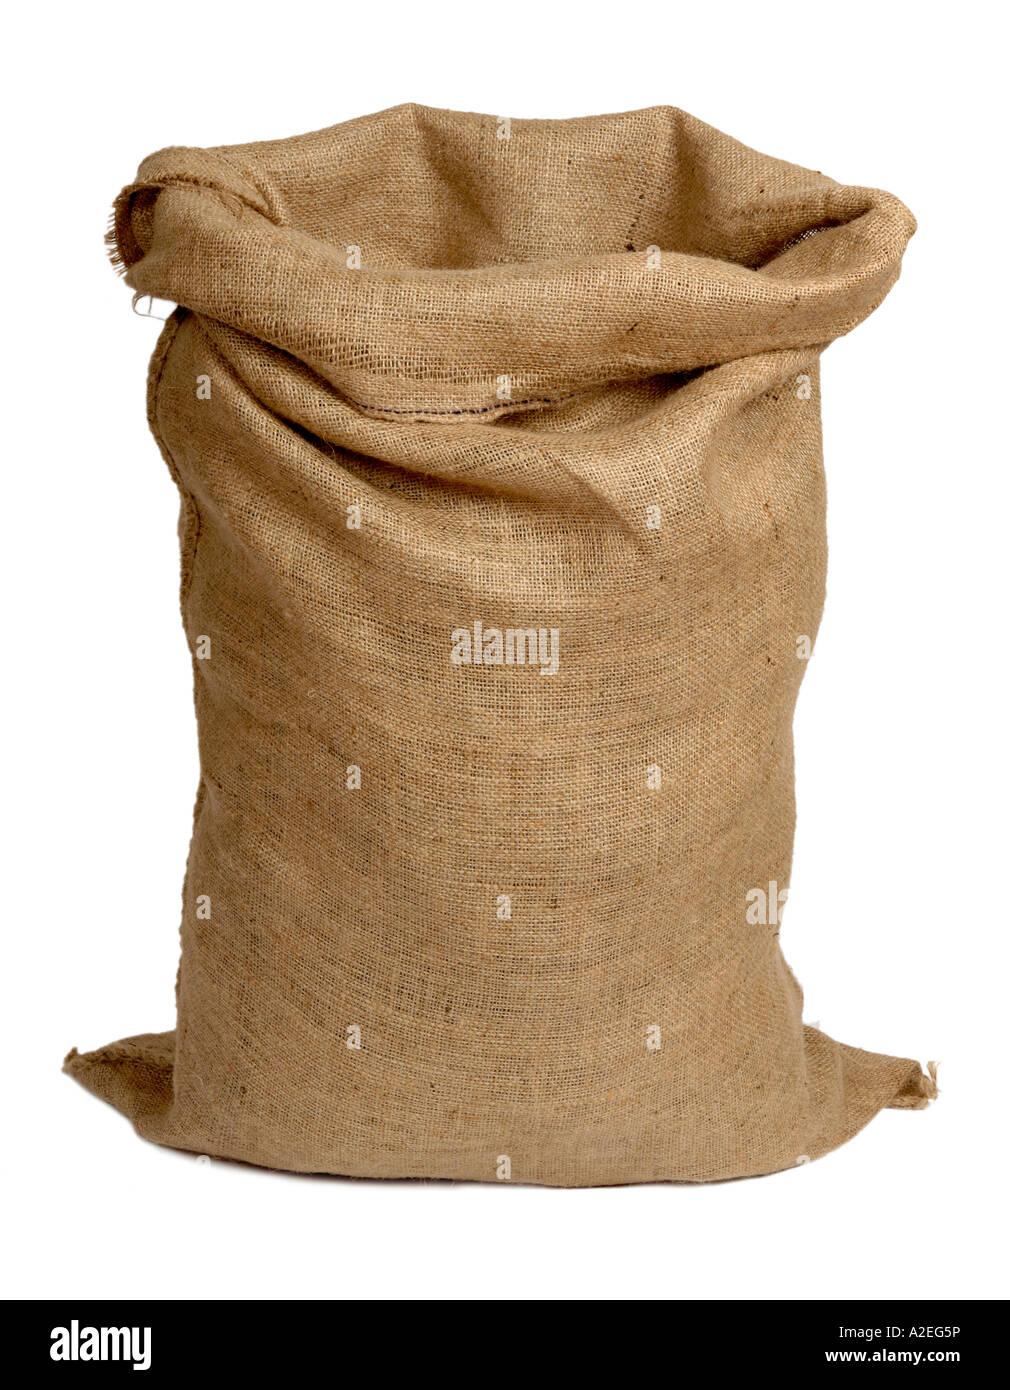 Hessian sack - Stock Image